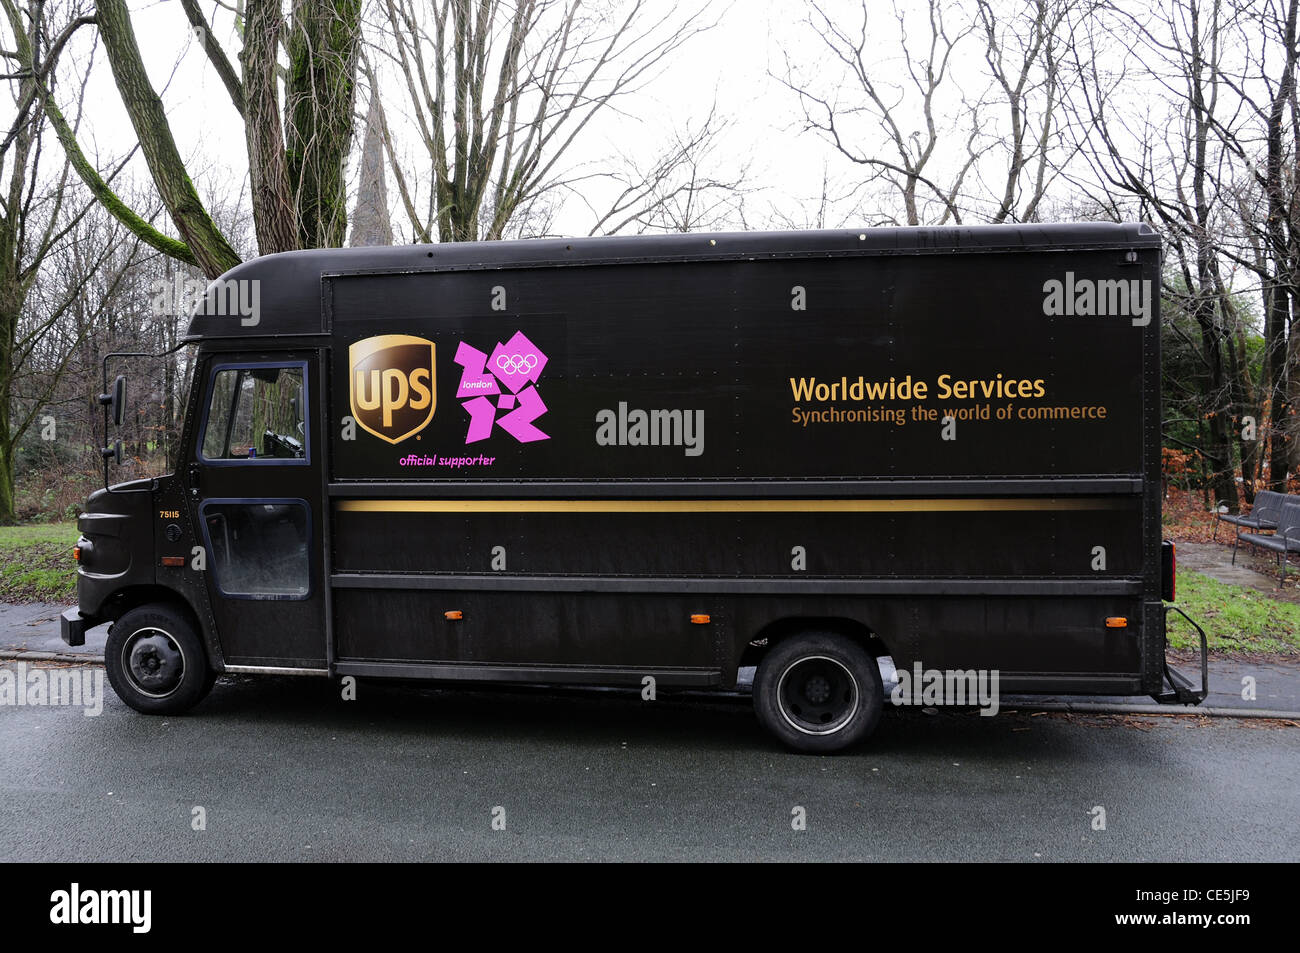 UK livraison UPS van avec logo 2012 Photo Stock